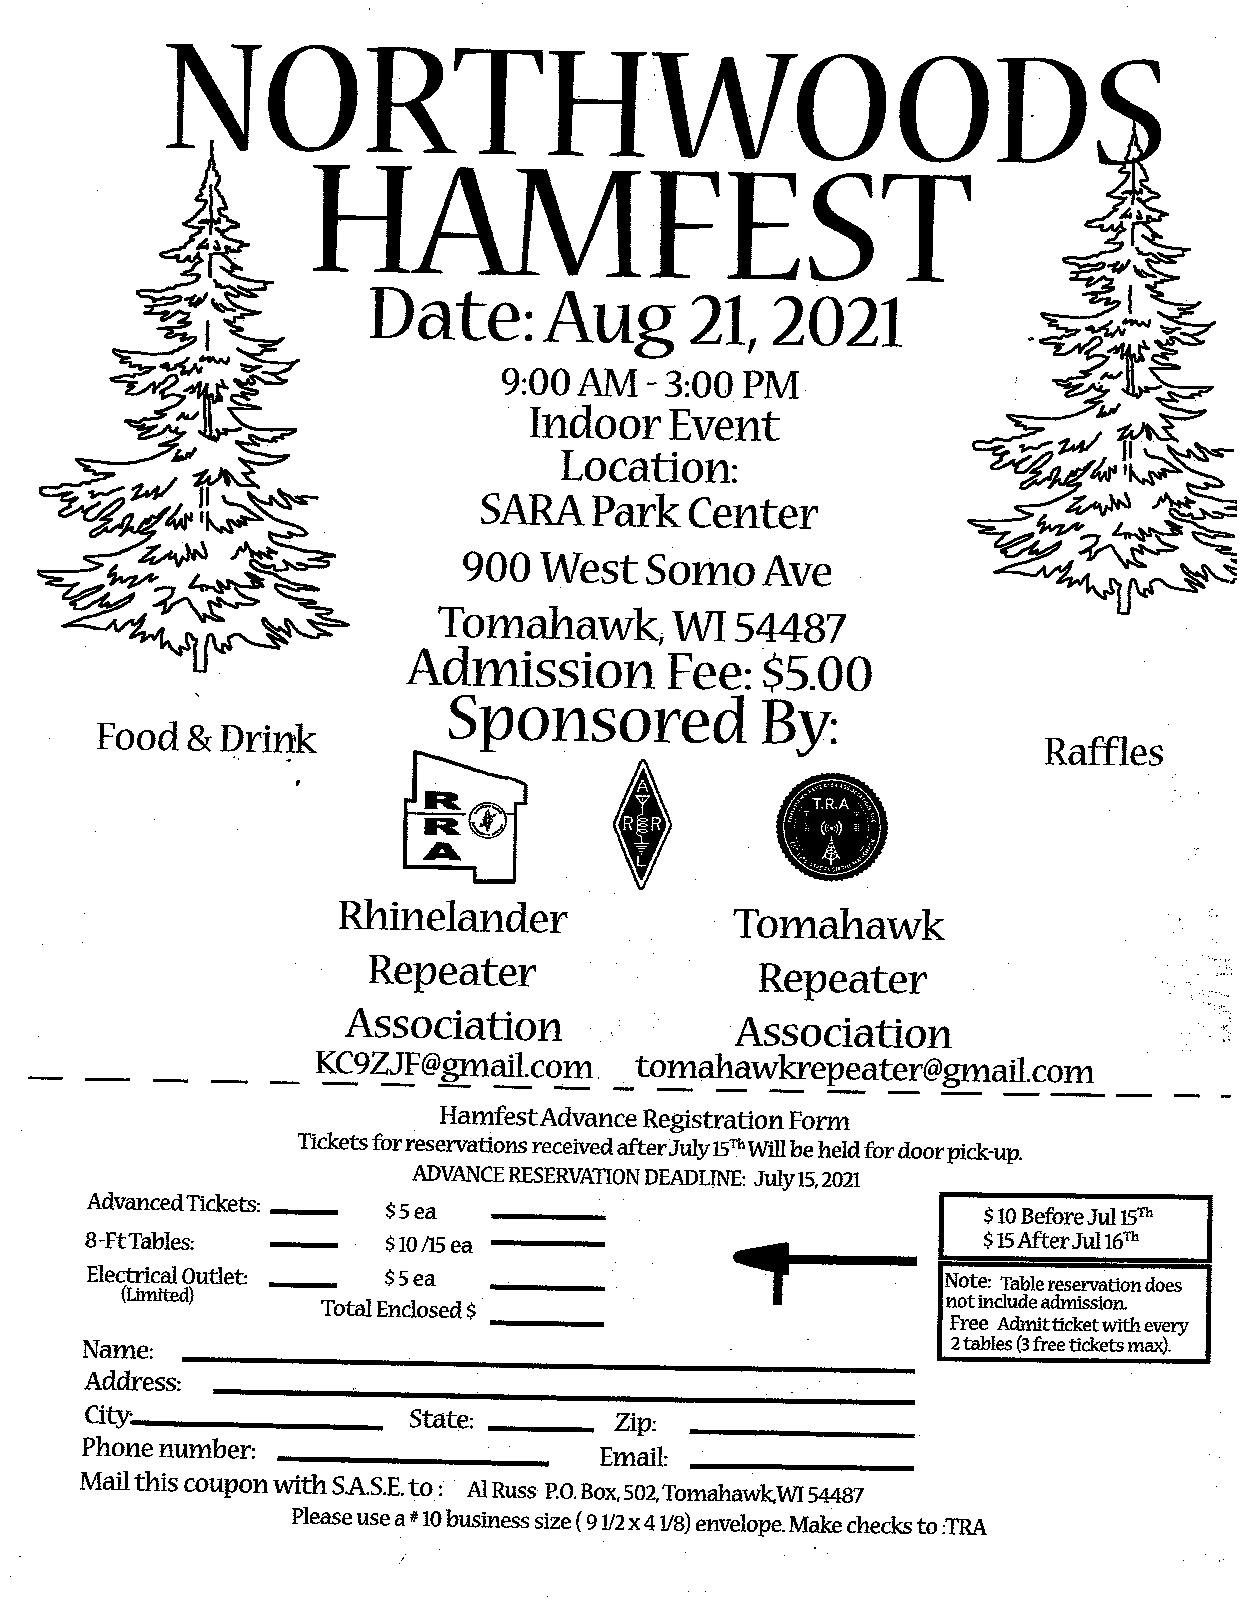 Northwoods Hamfest.jpg